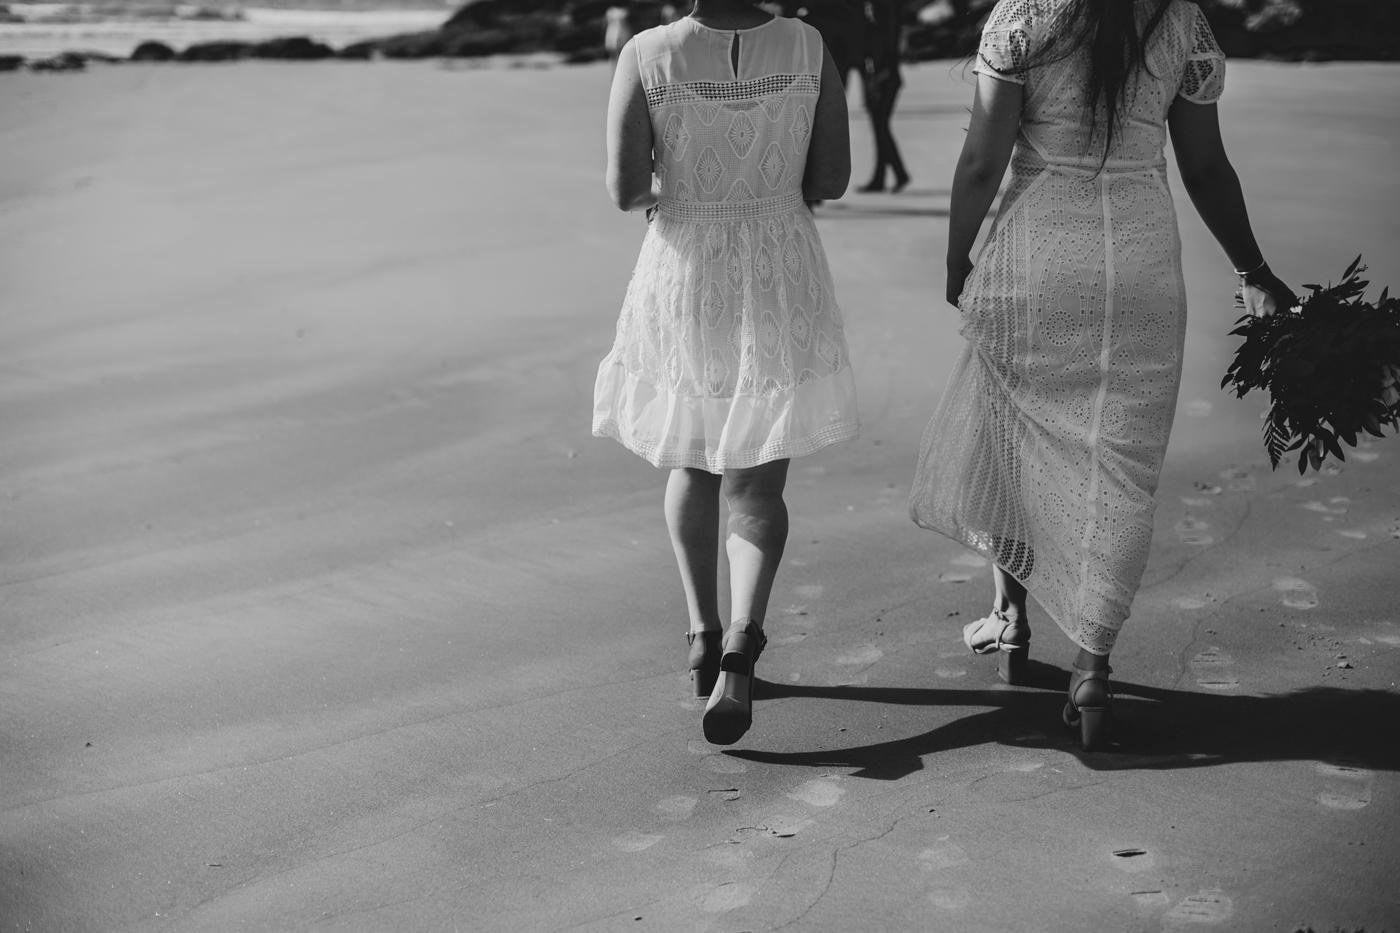 Ariana & Tim - Dunedin, New Zealand Wedding - Destination Wedding - Samantha Heather Photography-118.jpg